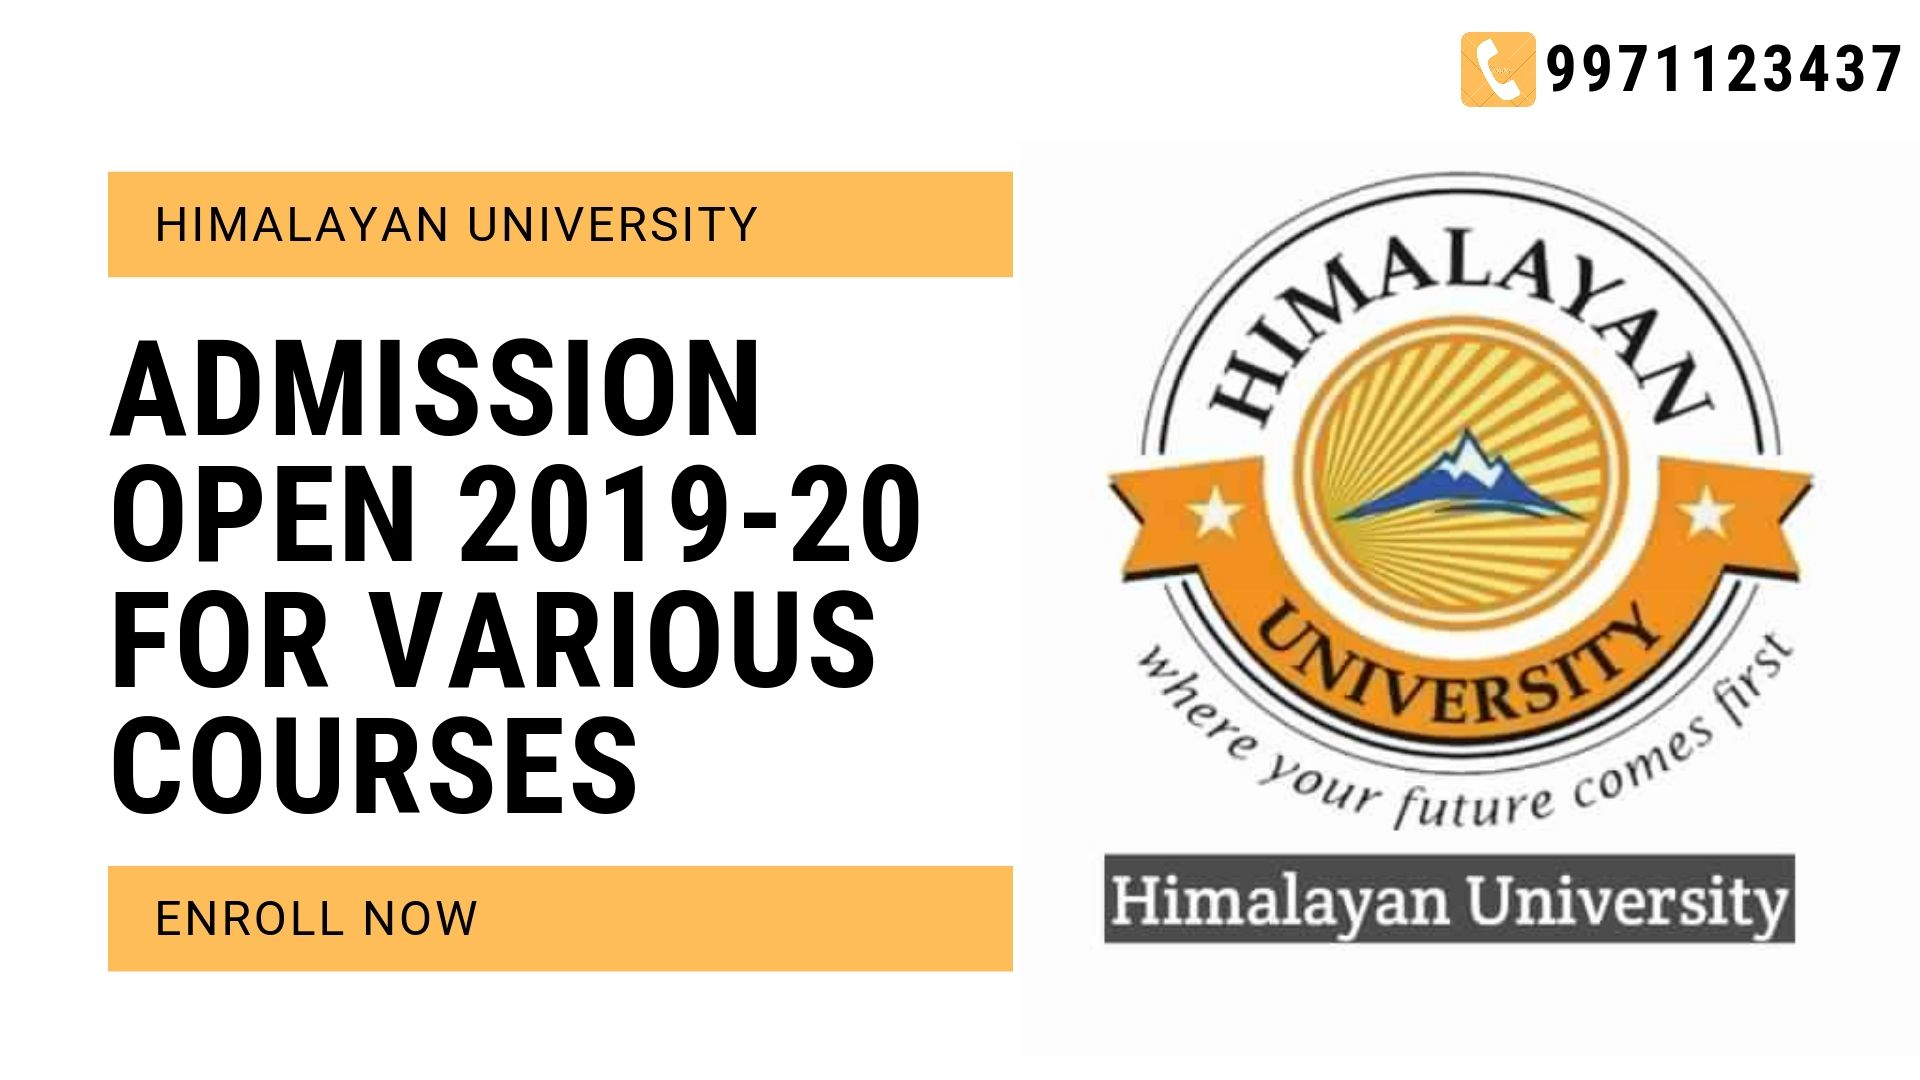 Himalayan University Distance Education Admission Open 2019 20 Distance Learning Education University University